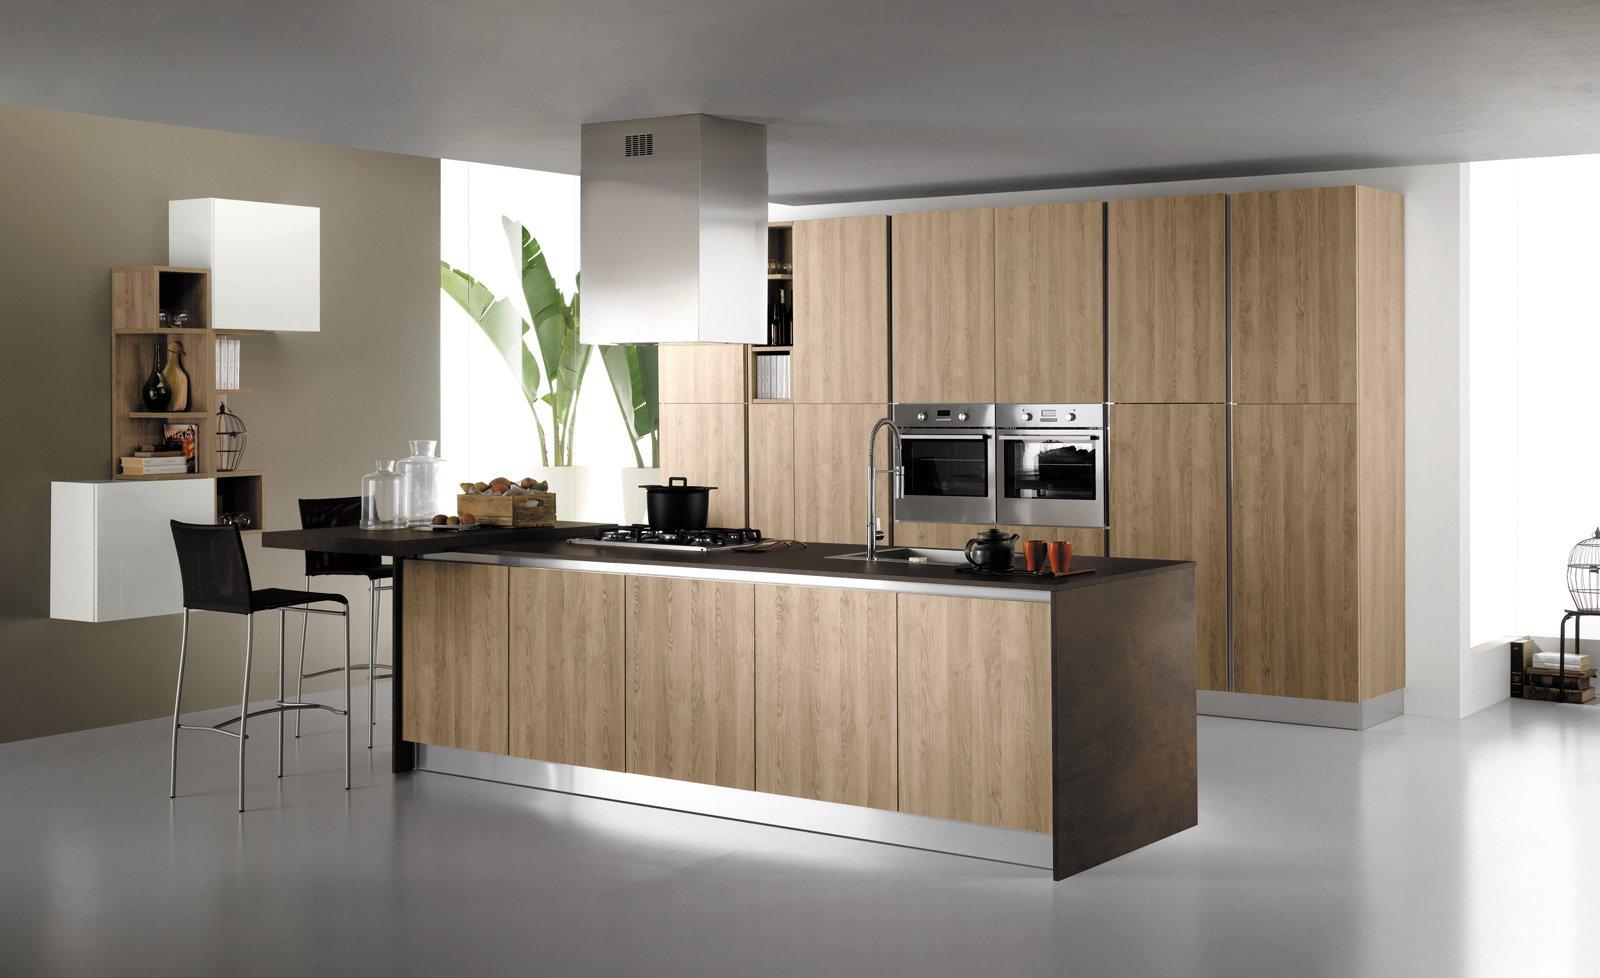 Arredamento cucine piccole cose di casa - Cucine mobilturi ...